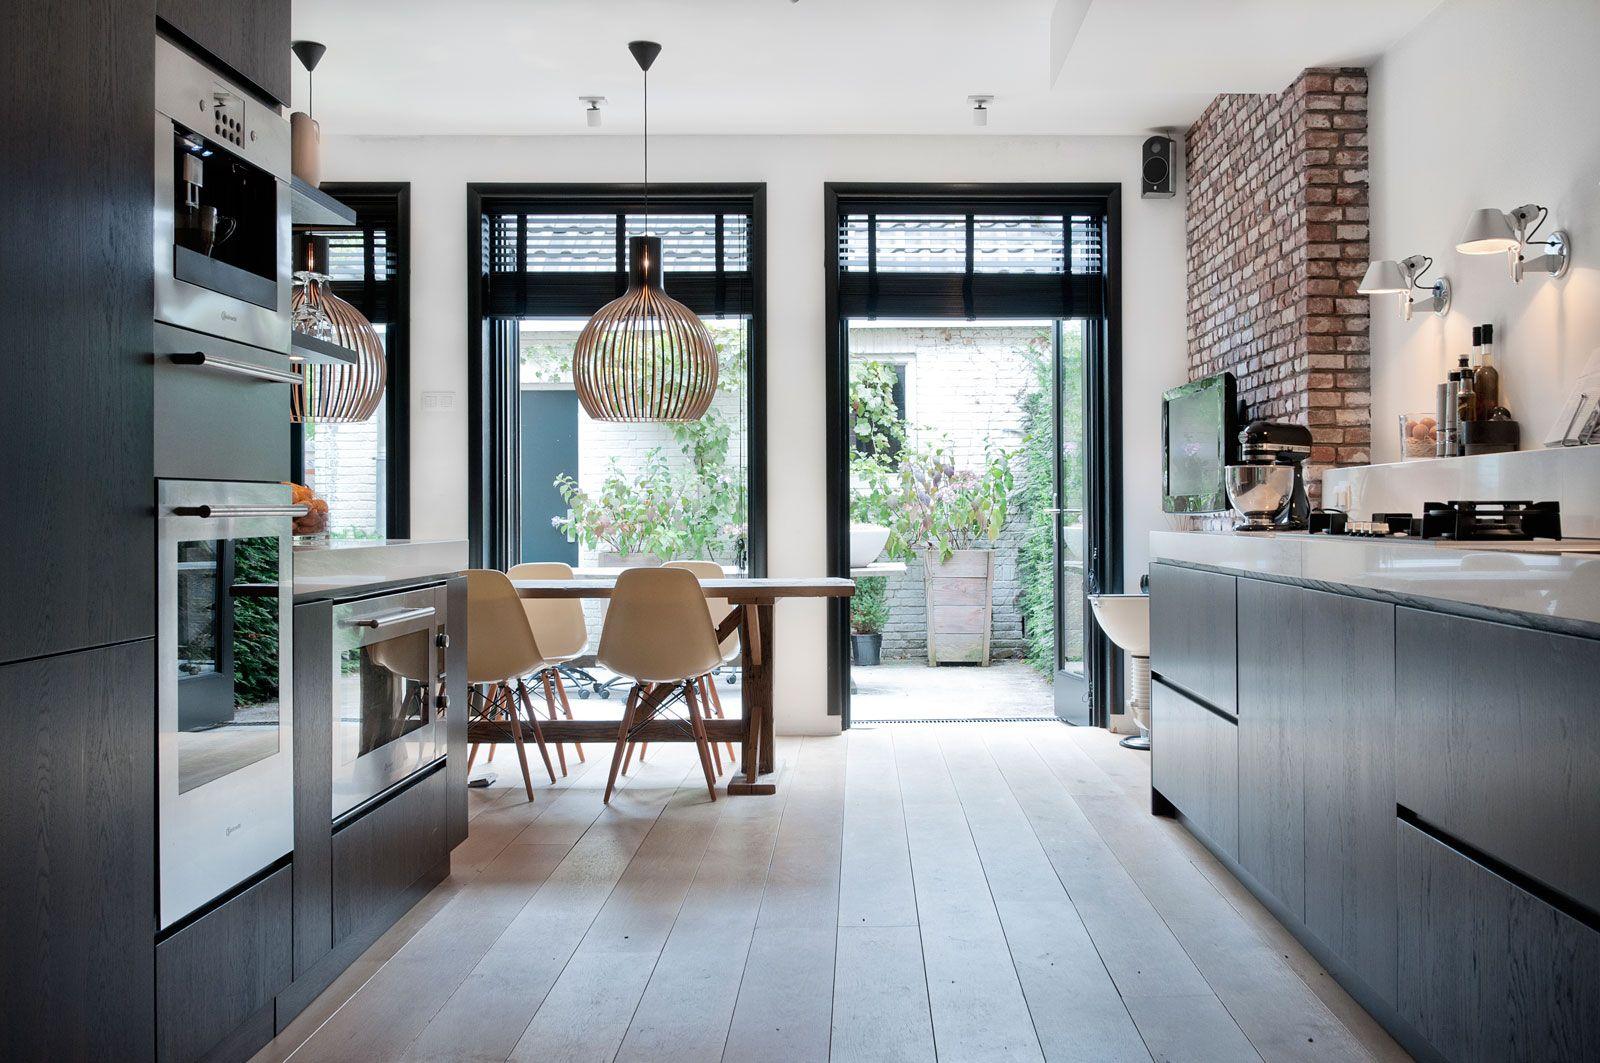 Pin van joelle kwakernaak op keuken keuken zwarte